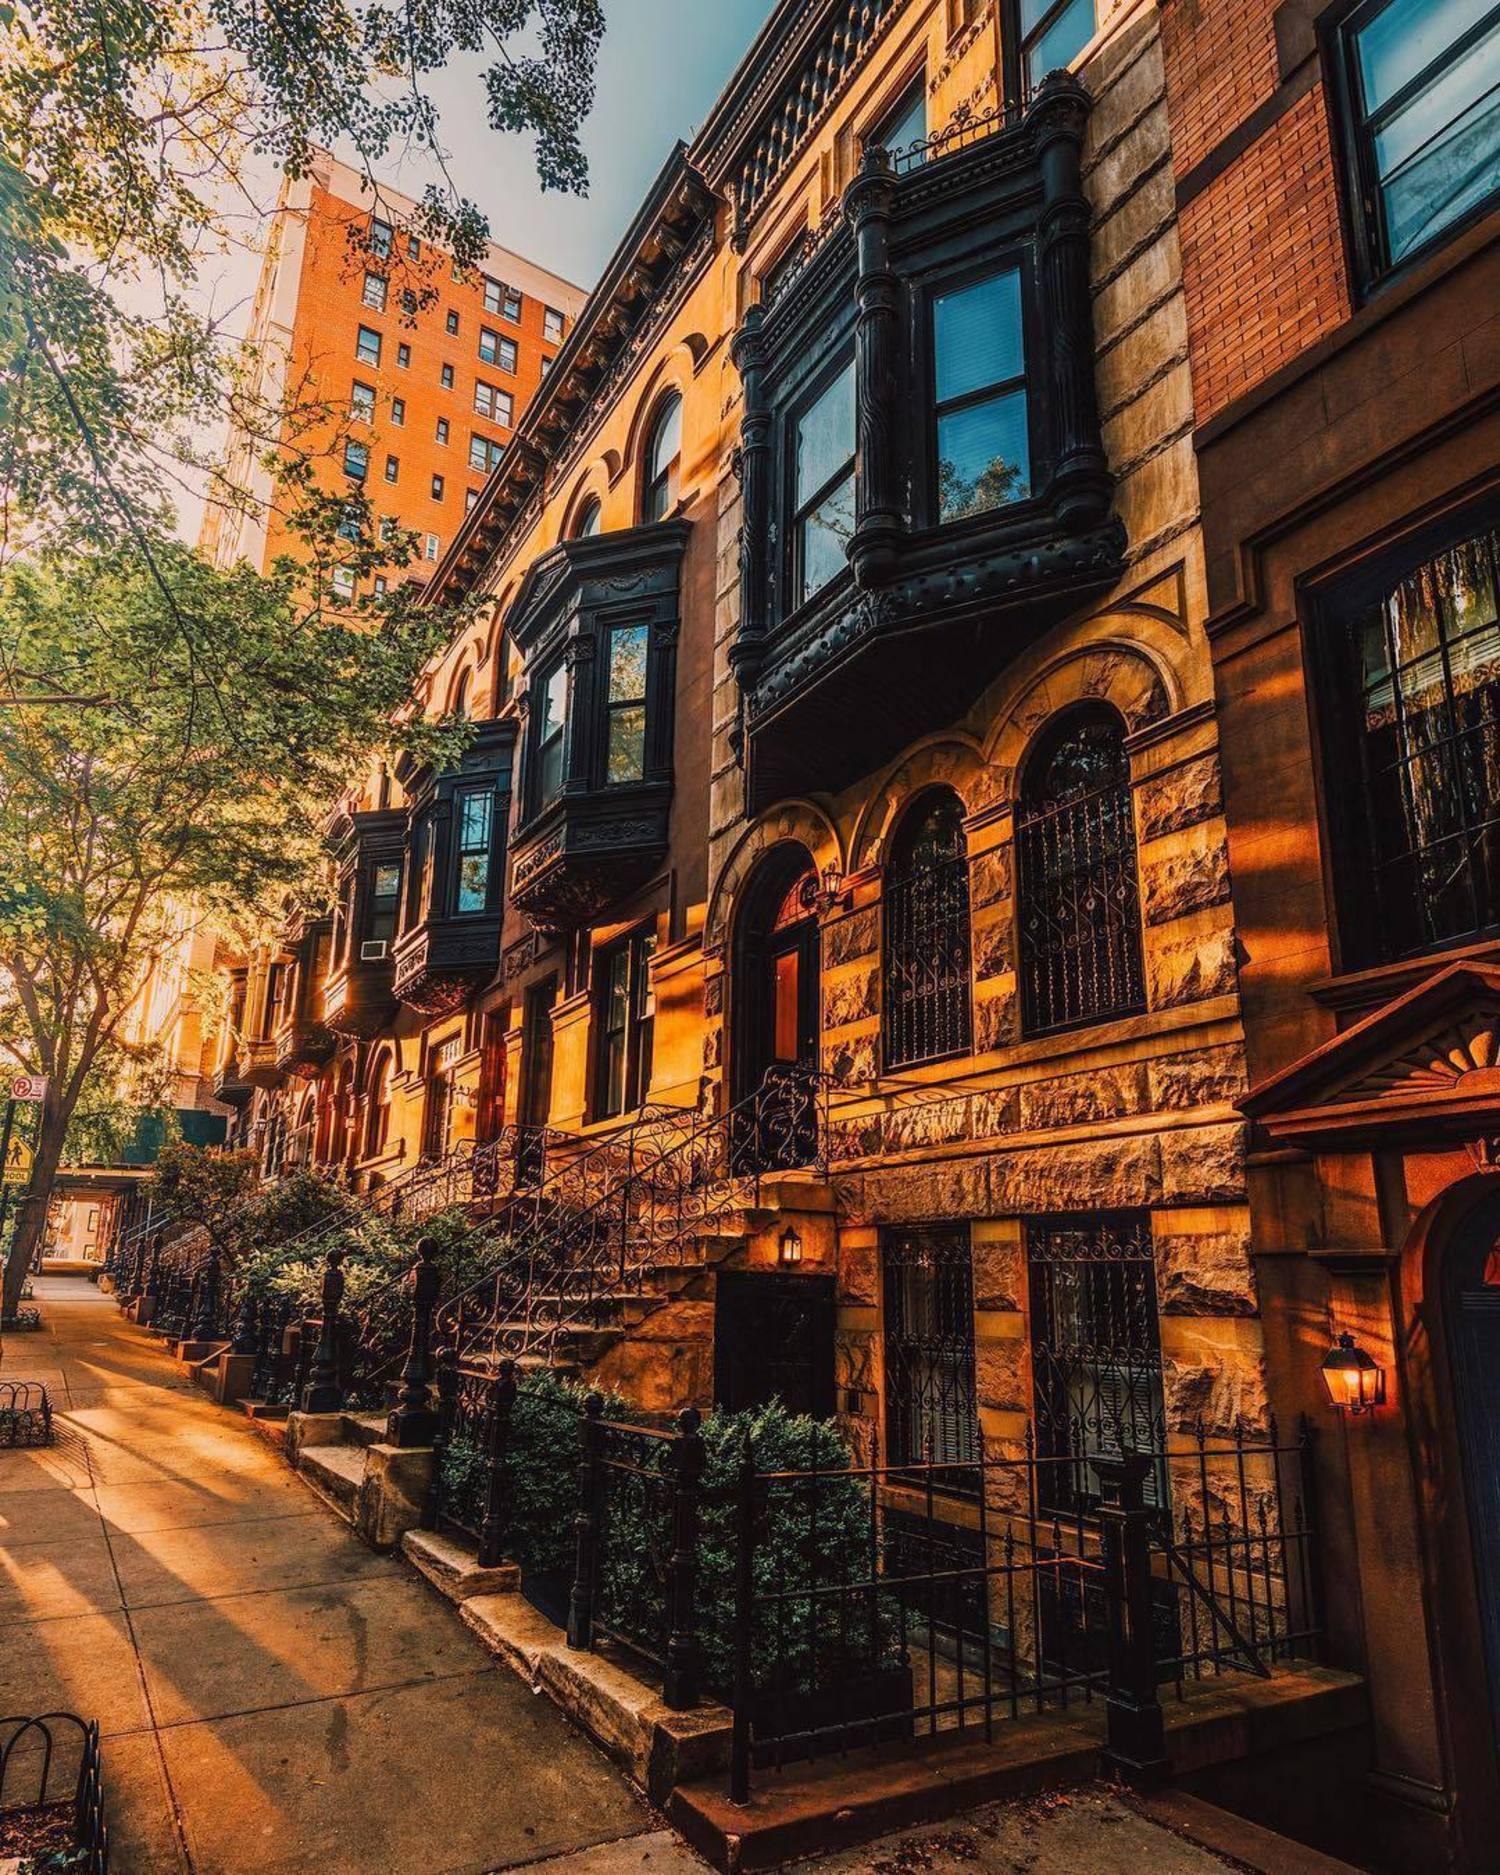 Upper East Side, Manhattan. Photo via @mc_gutty #viewingnyc #newyork #newyorkcity #nyc